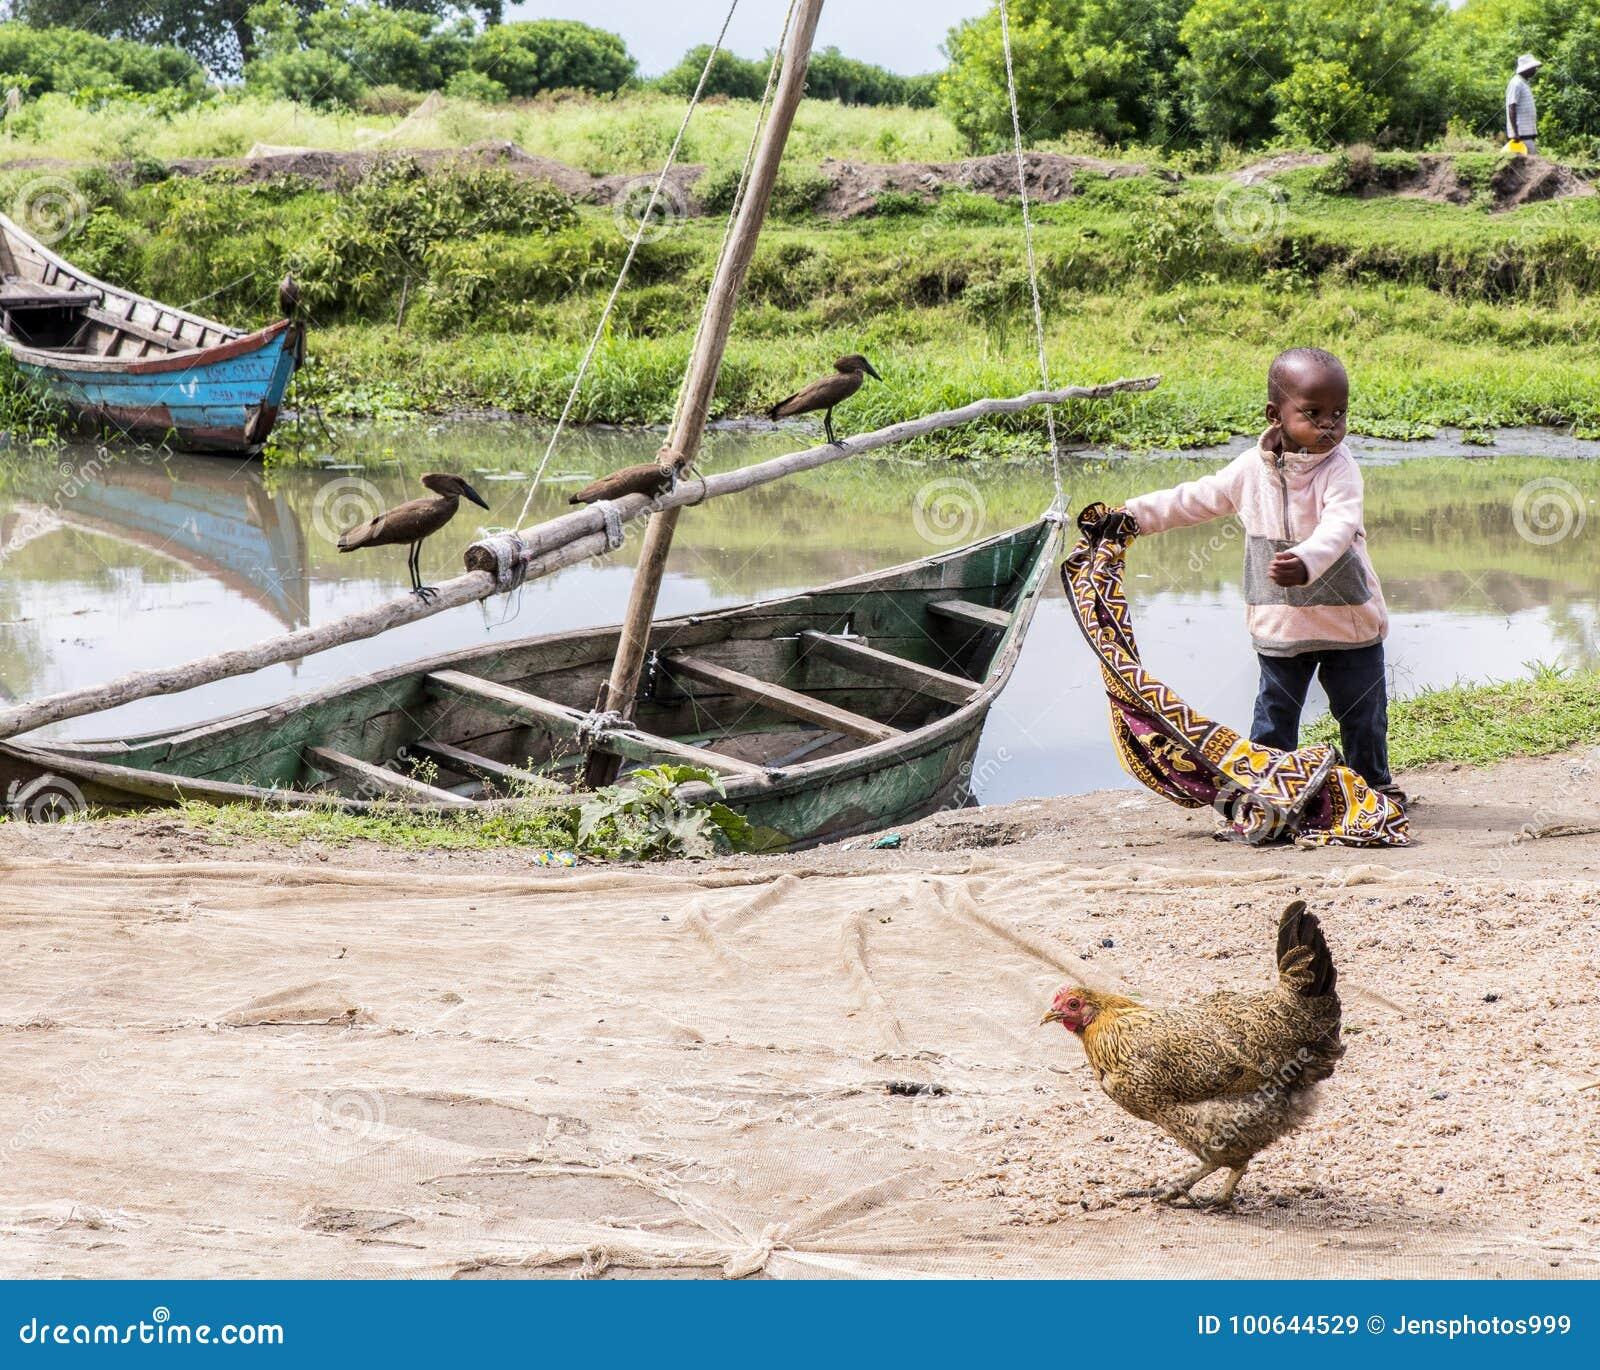 Scene, Water's Edge, Fishing Village, Lake Victoria, Kenya